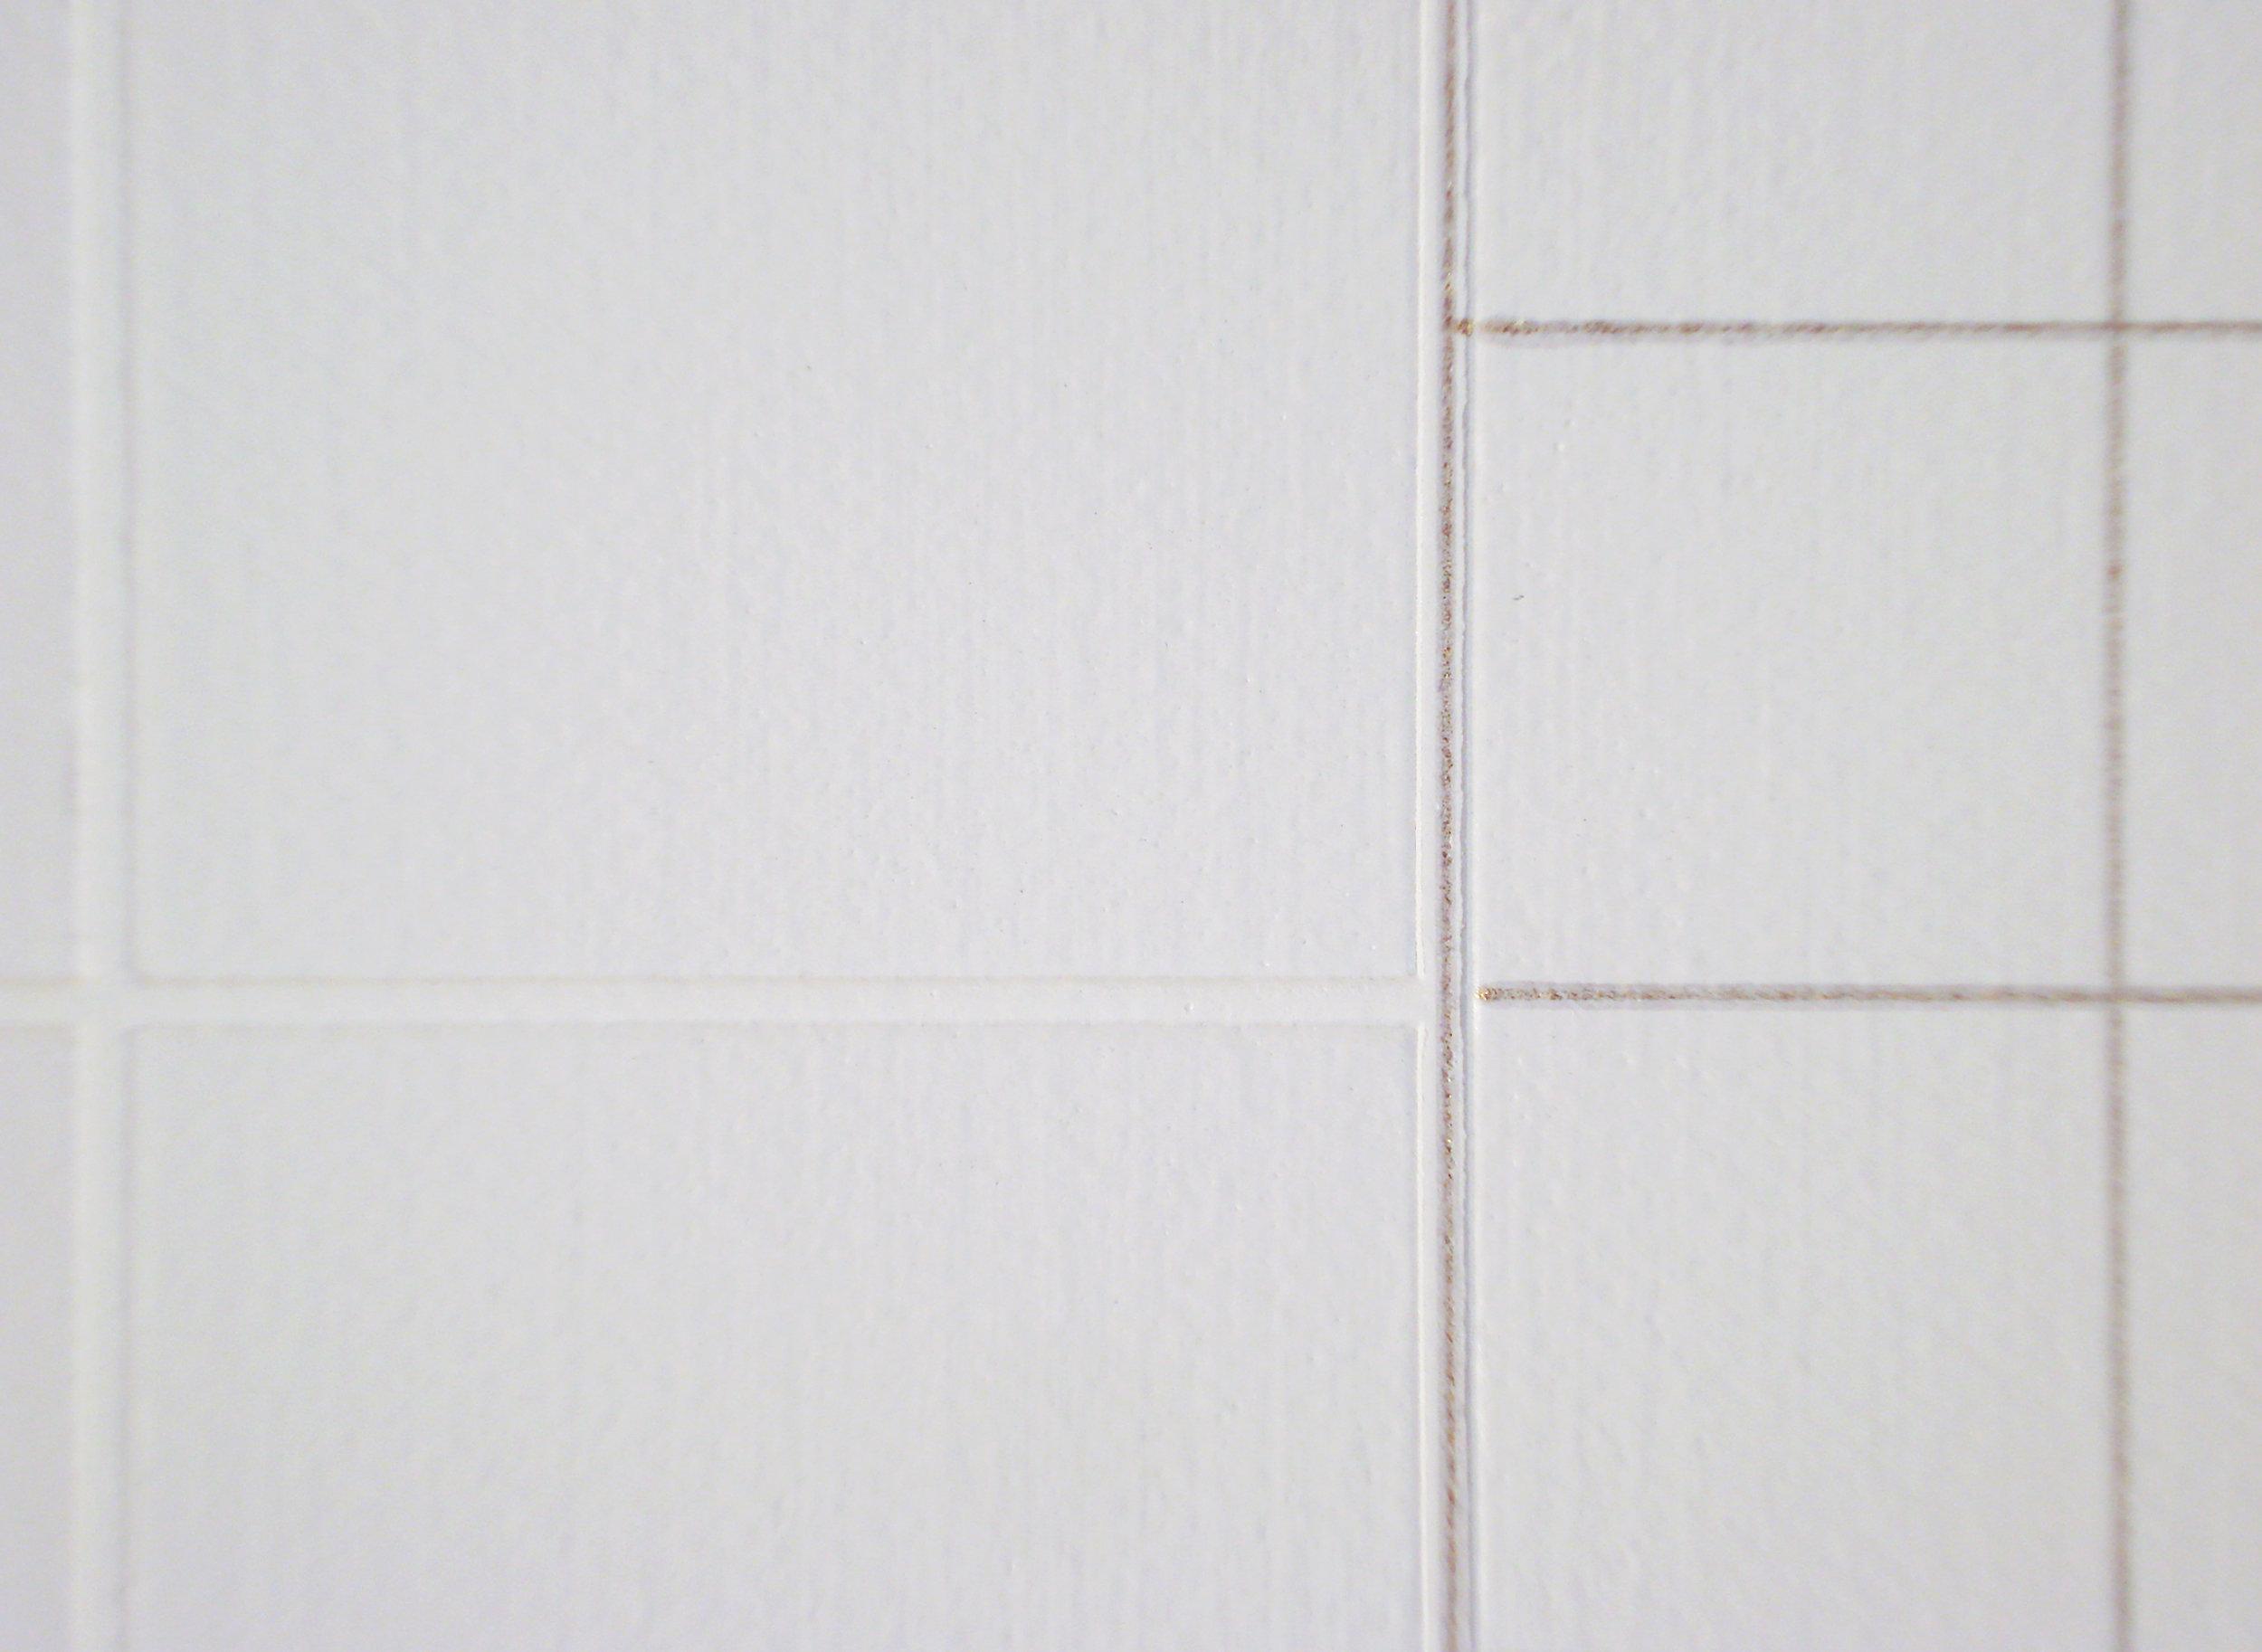 Yantra-origo-metrum [20180512]_2018_acrylic-on-canvas_29 1-2x23 5-8 in.[75x60cm]-9.jpg